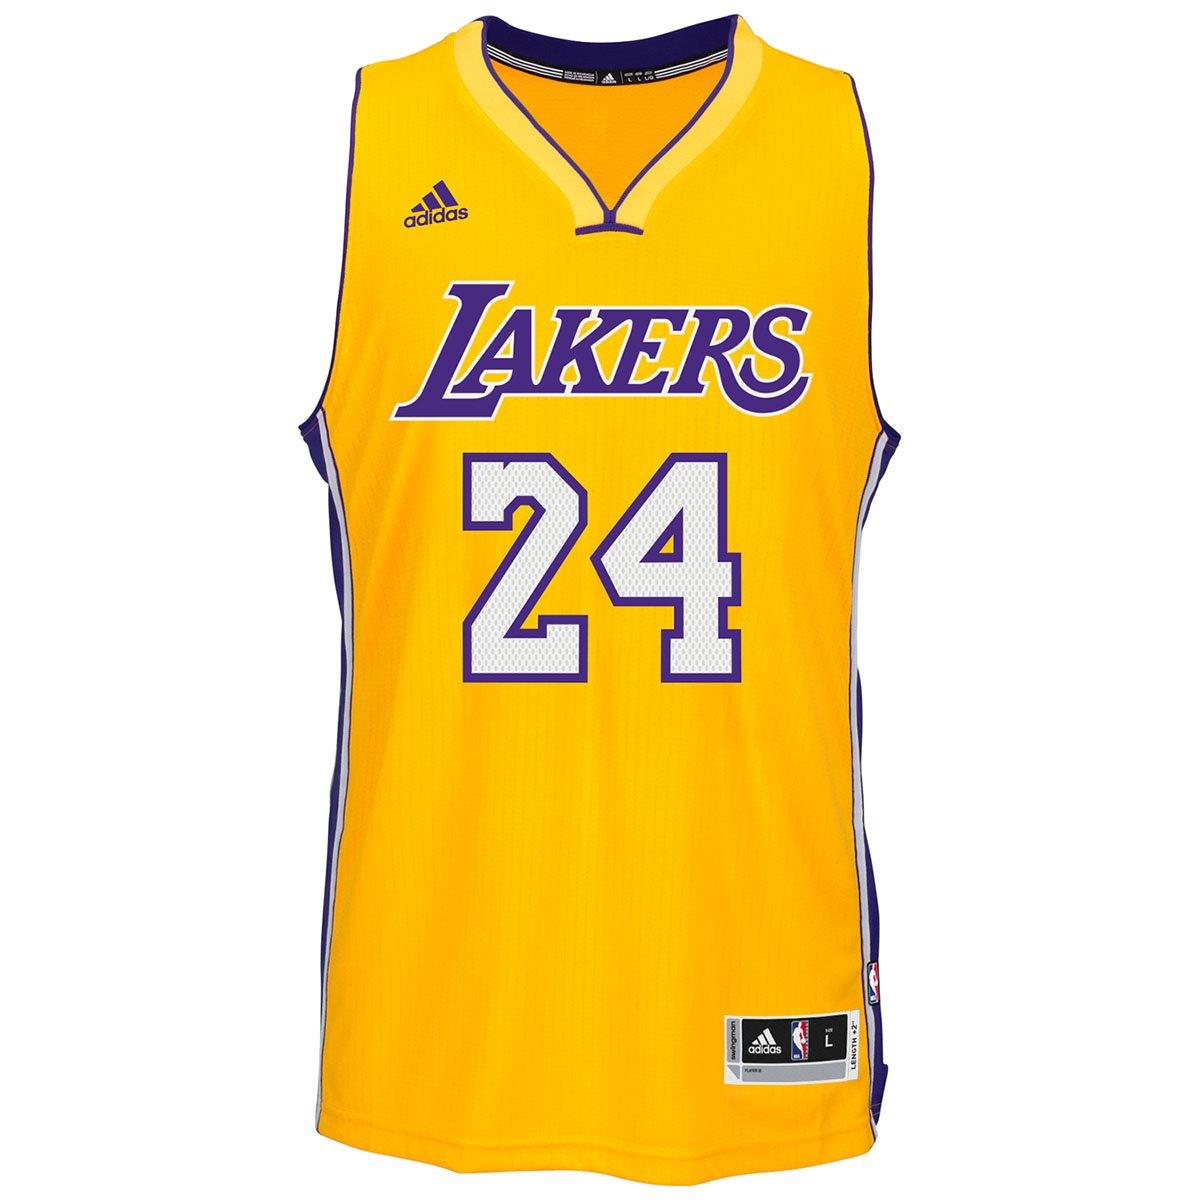 size 40 bf0b3 12488 NBA Men's Los Angeles Lakers Kobe Bryant #24 Climacool Gold Swingman Jersey  7470